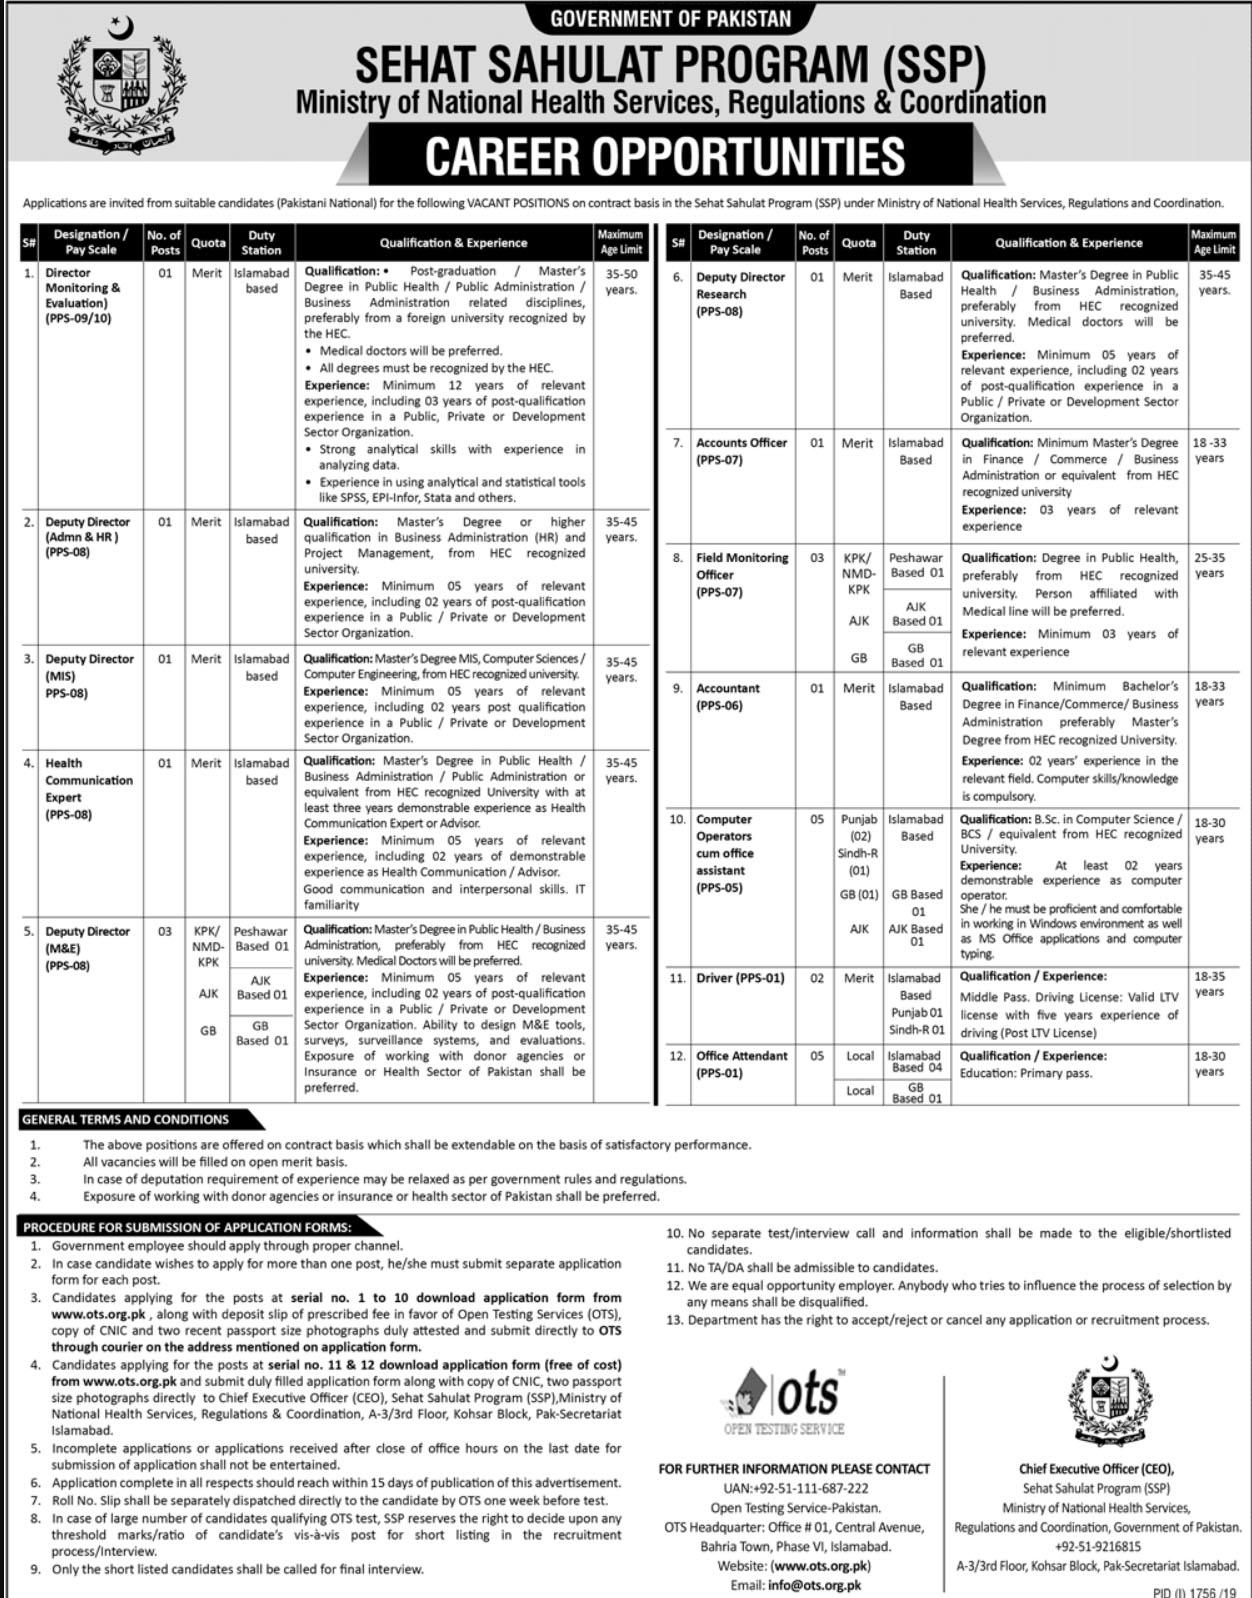 Jobs in Sehat Sahulat Program (SSP) Oct 22019